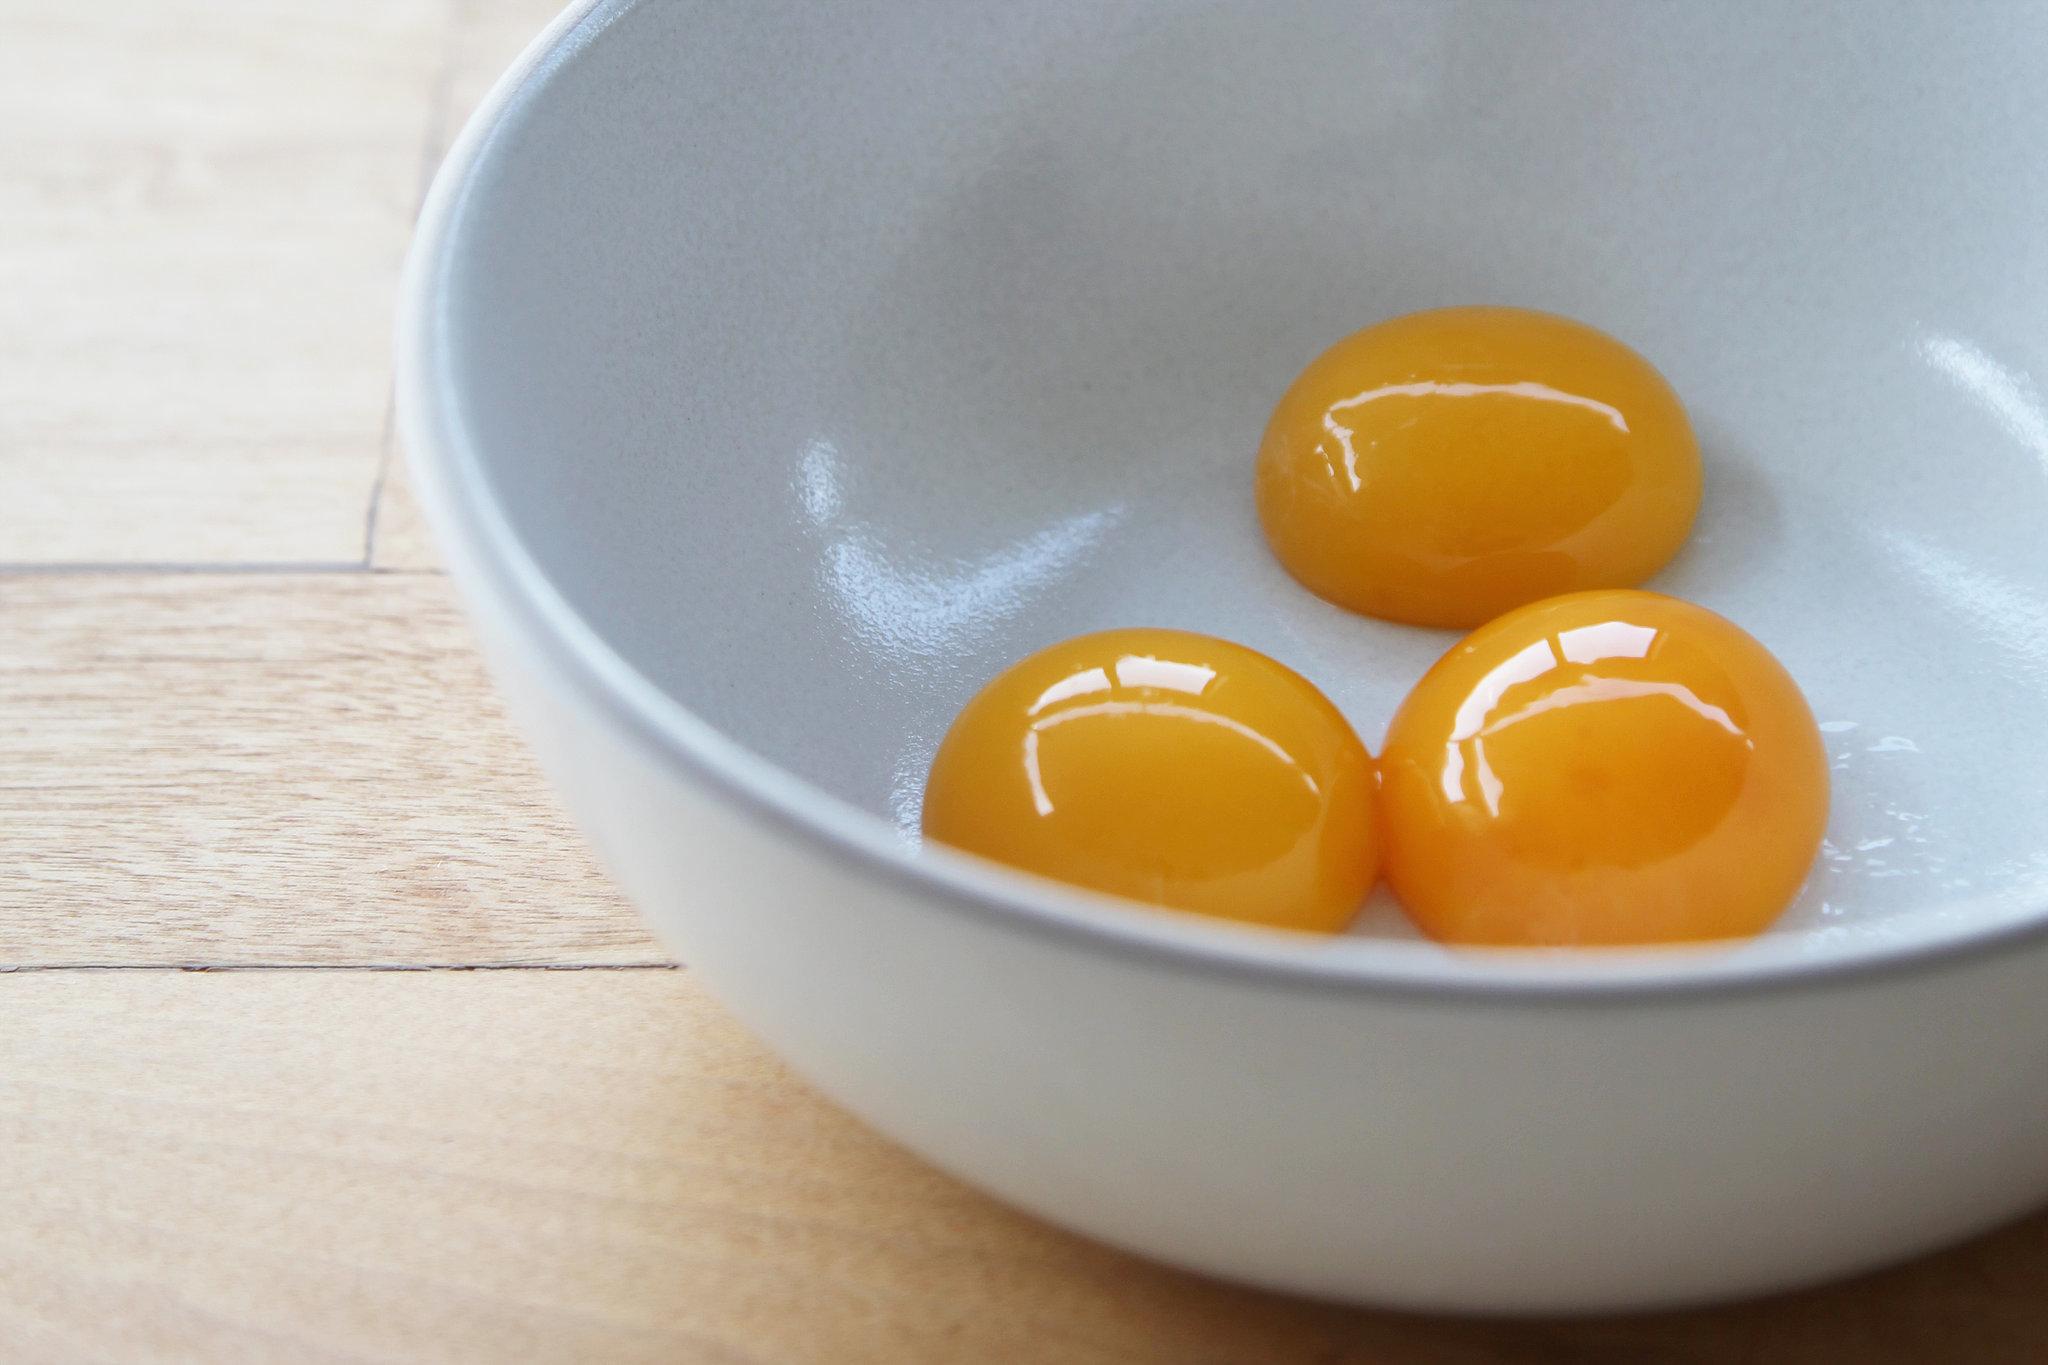 077fa881_Egg-Yolks-2.xxxlarge_2x